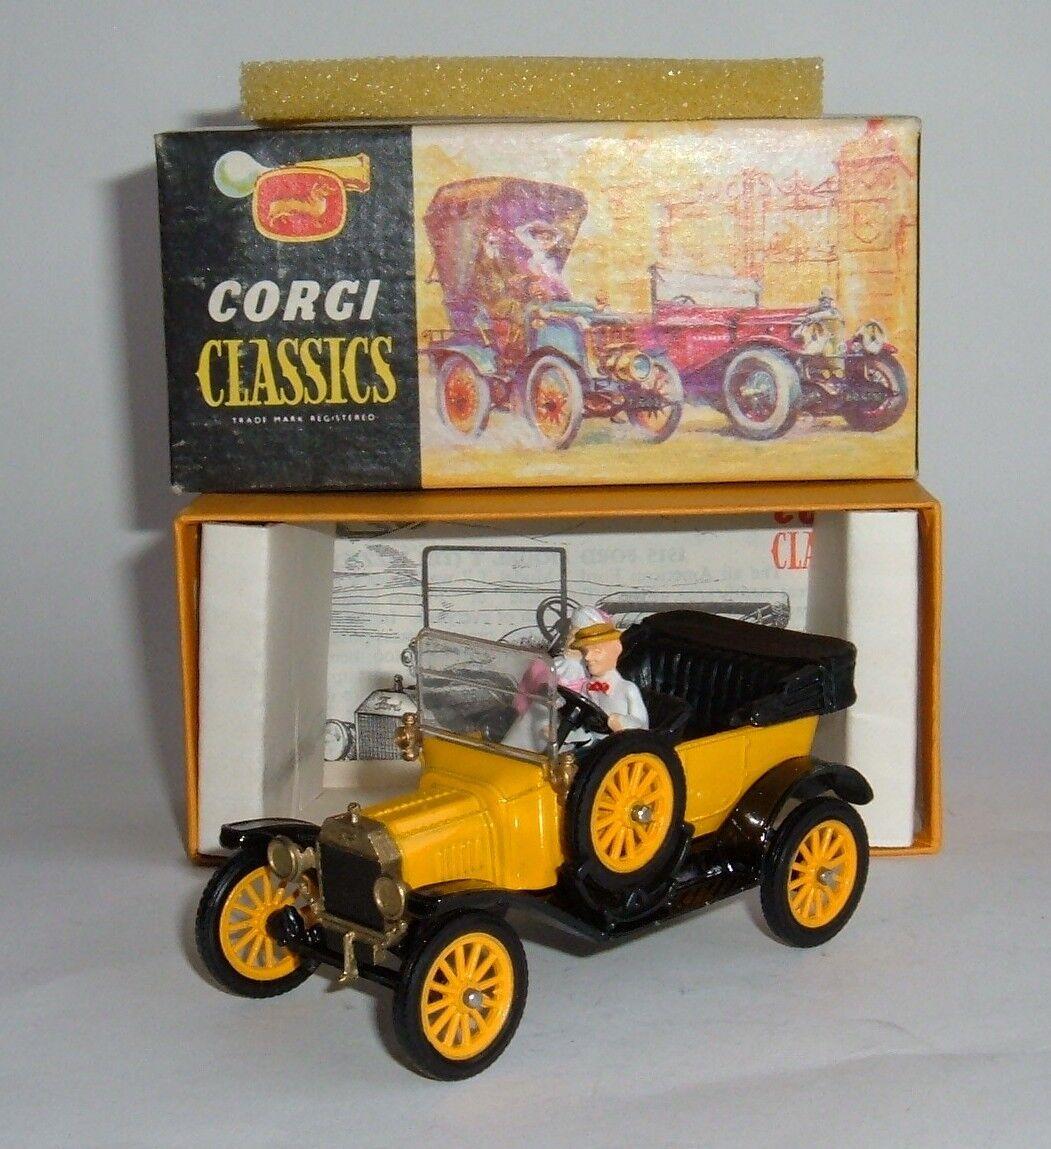 CORGI Giocattoli Classici N. 9012, 1915 FORD MODEL 'T' , - SUPERBA